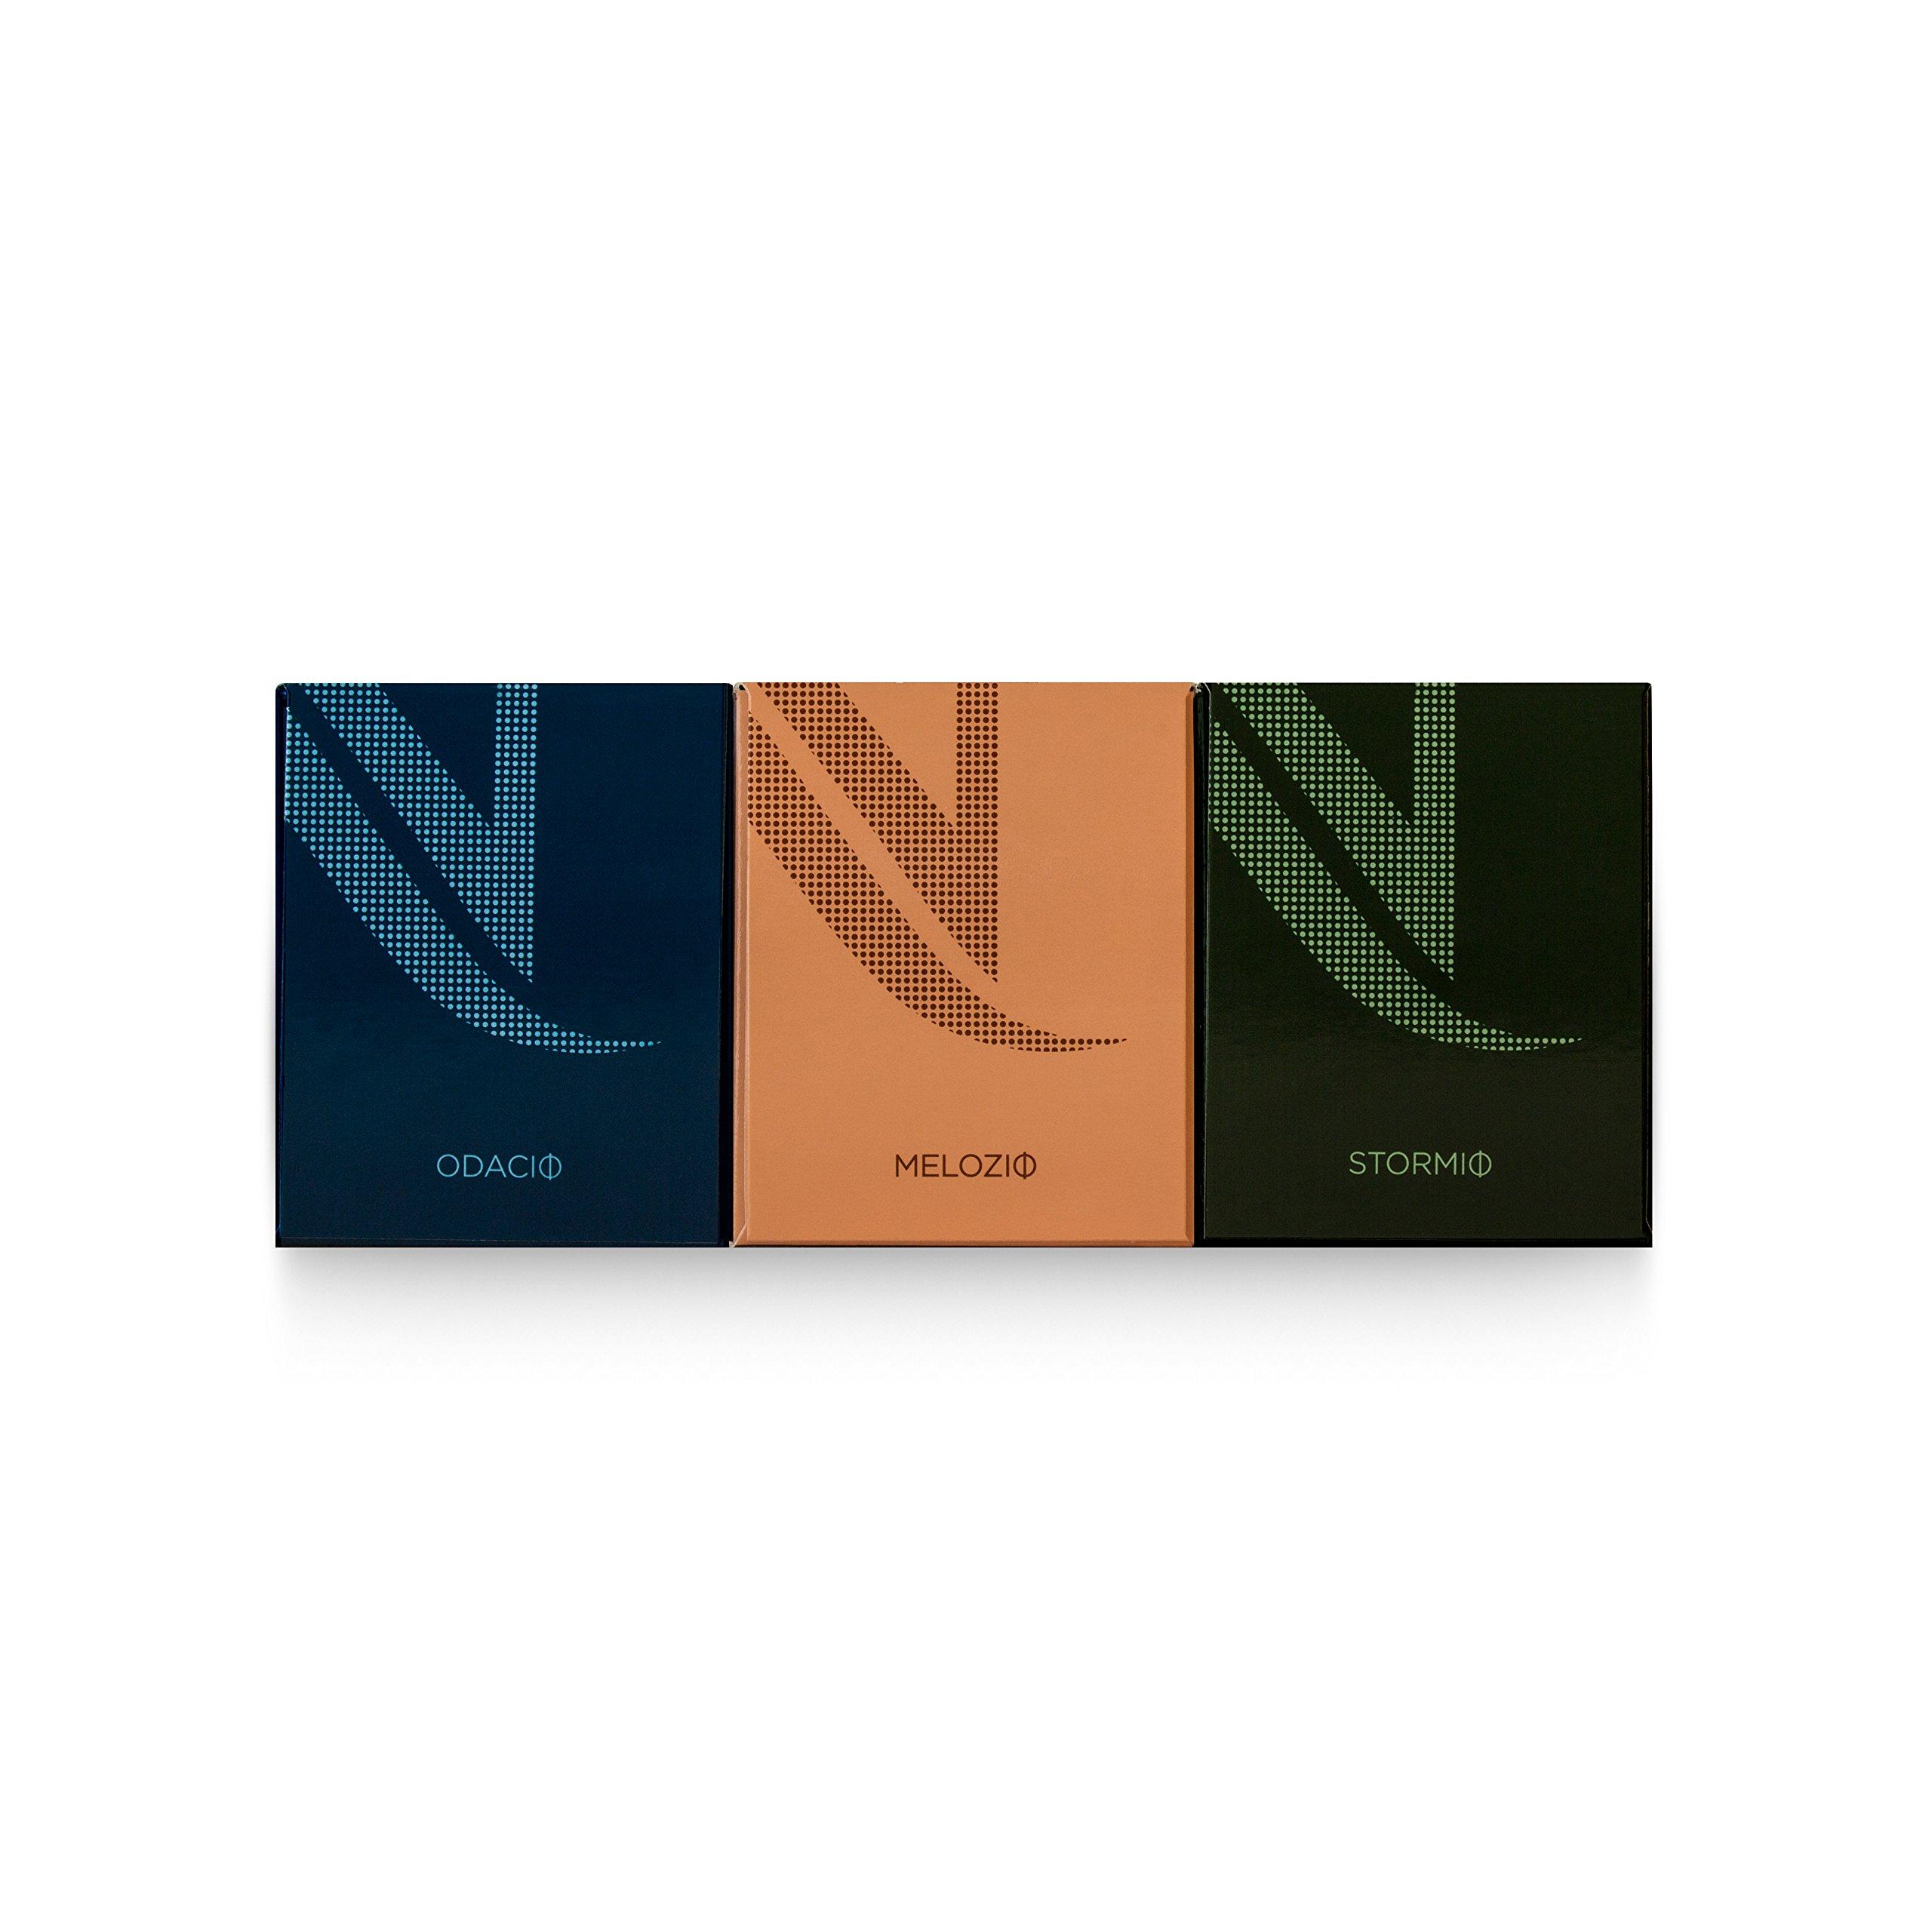 Nespresso Vertuoline Best Seller Assortment, 10 Count (Pack of 3) by Nespresso (Image #3)